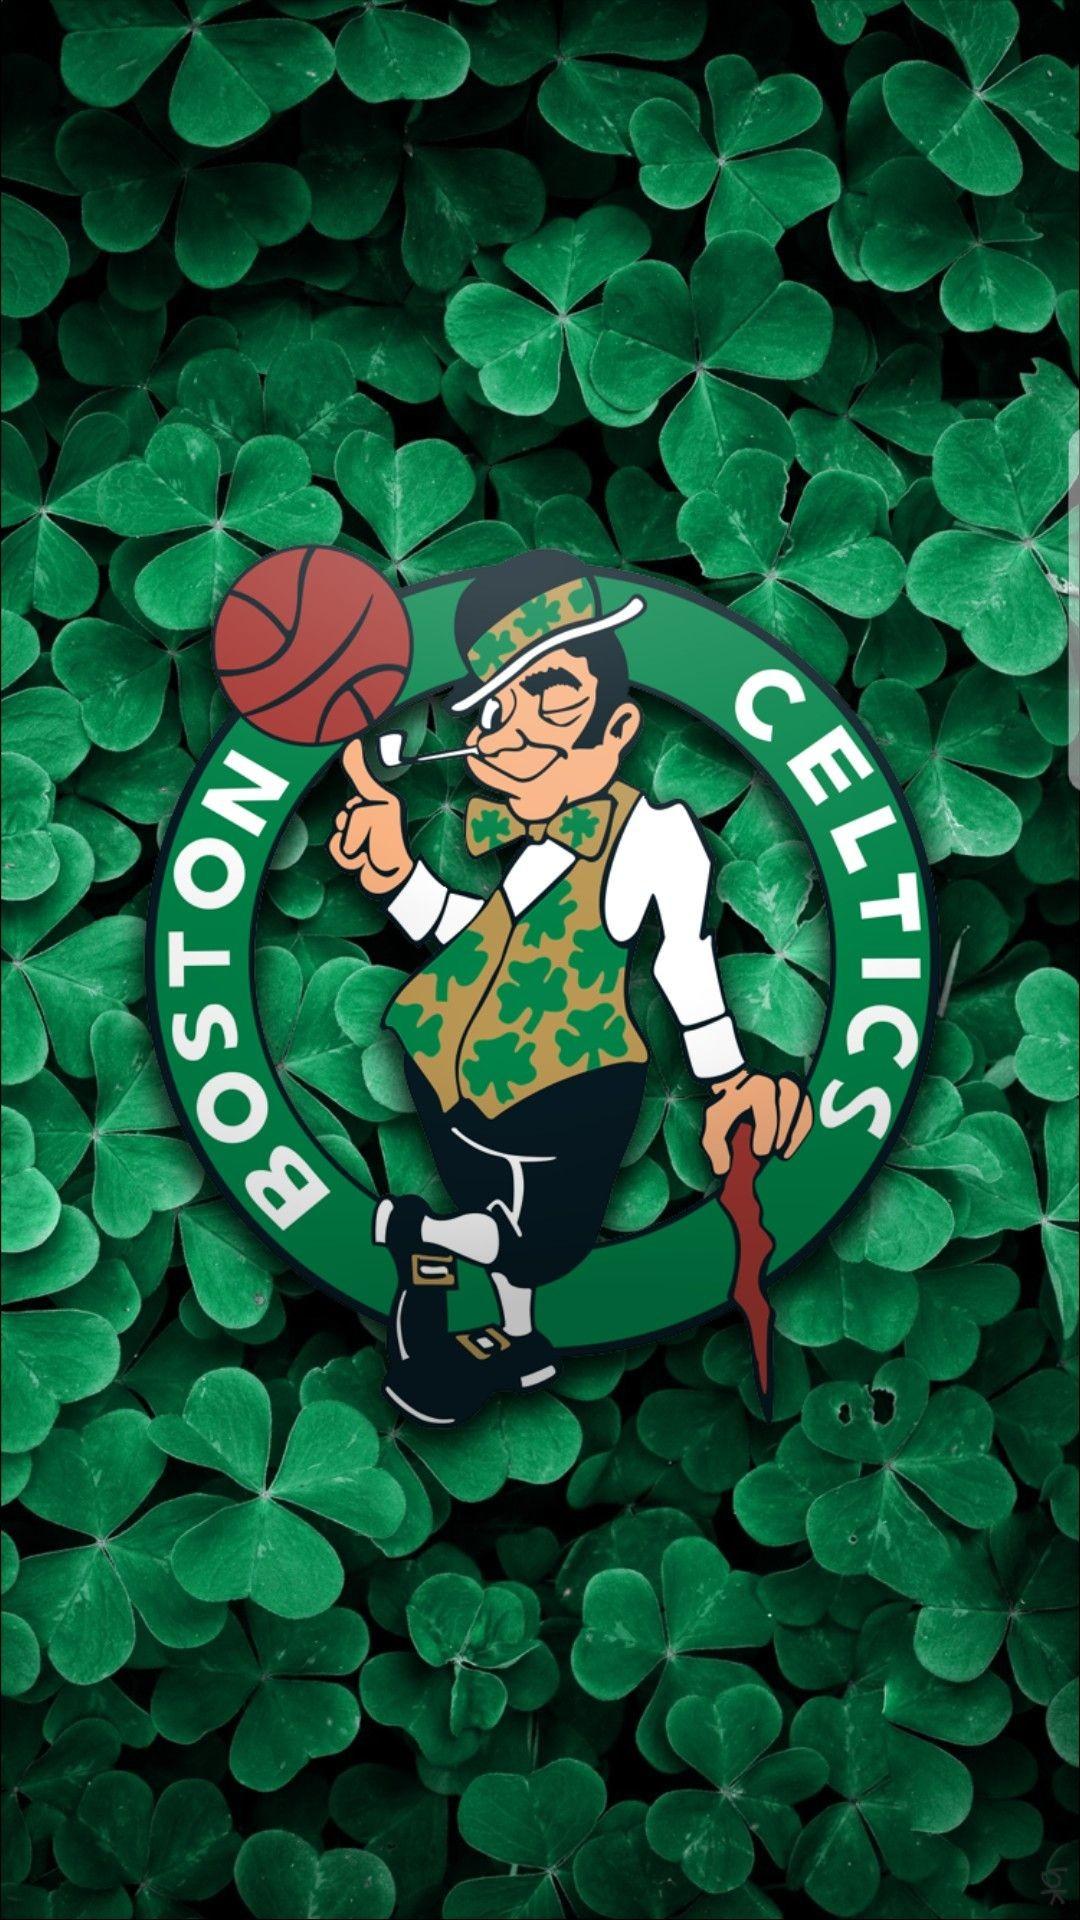 Res: 1080x1920, Celtics Basketball, Basketball Memes, Sports Basketball, Basketball  Pictures, Basketball Players, Boston